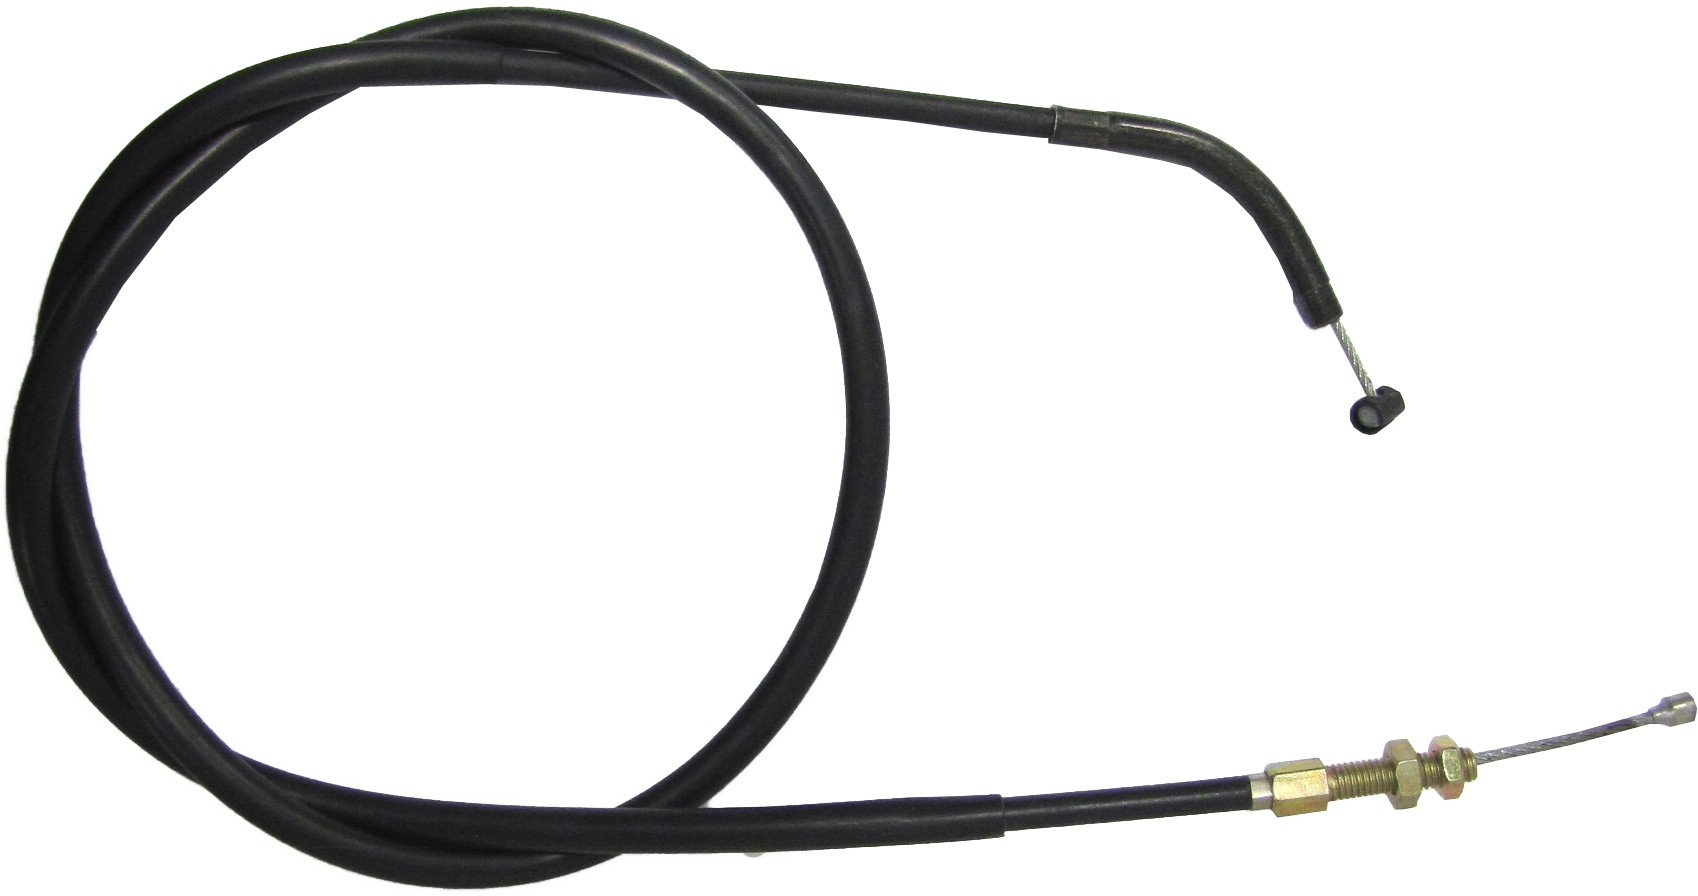 Each Clutch Cable Triumph 1050 Sprint 05-09